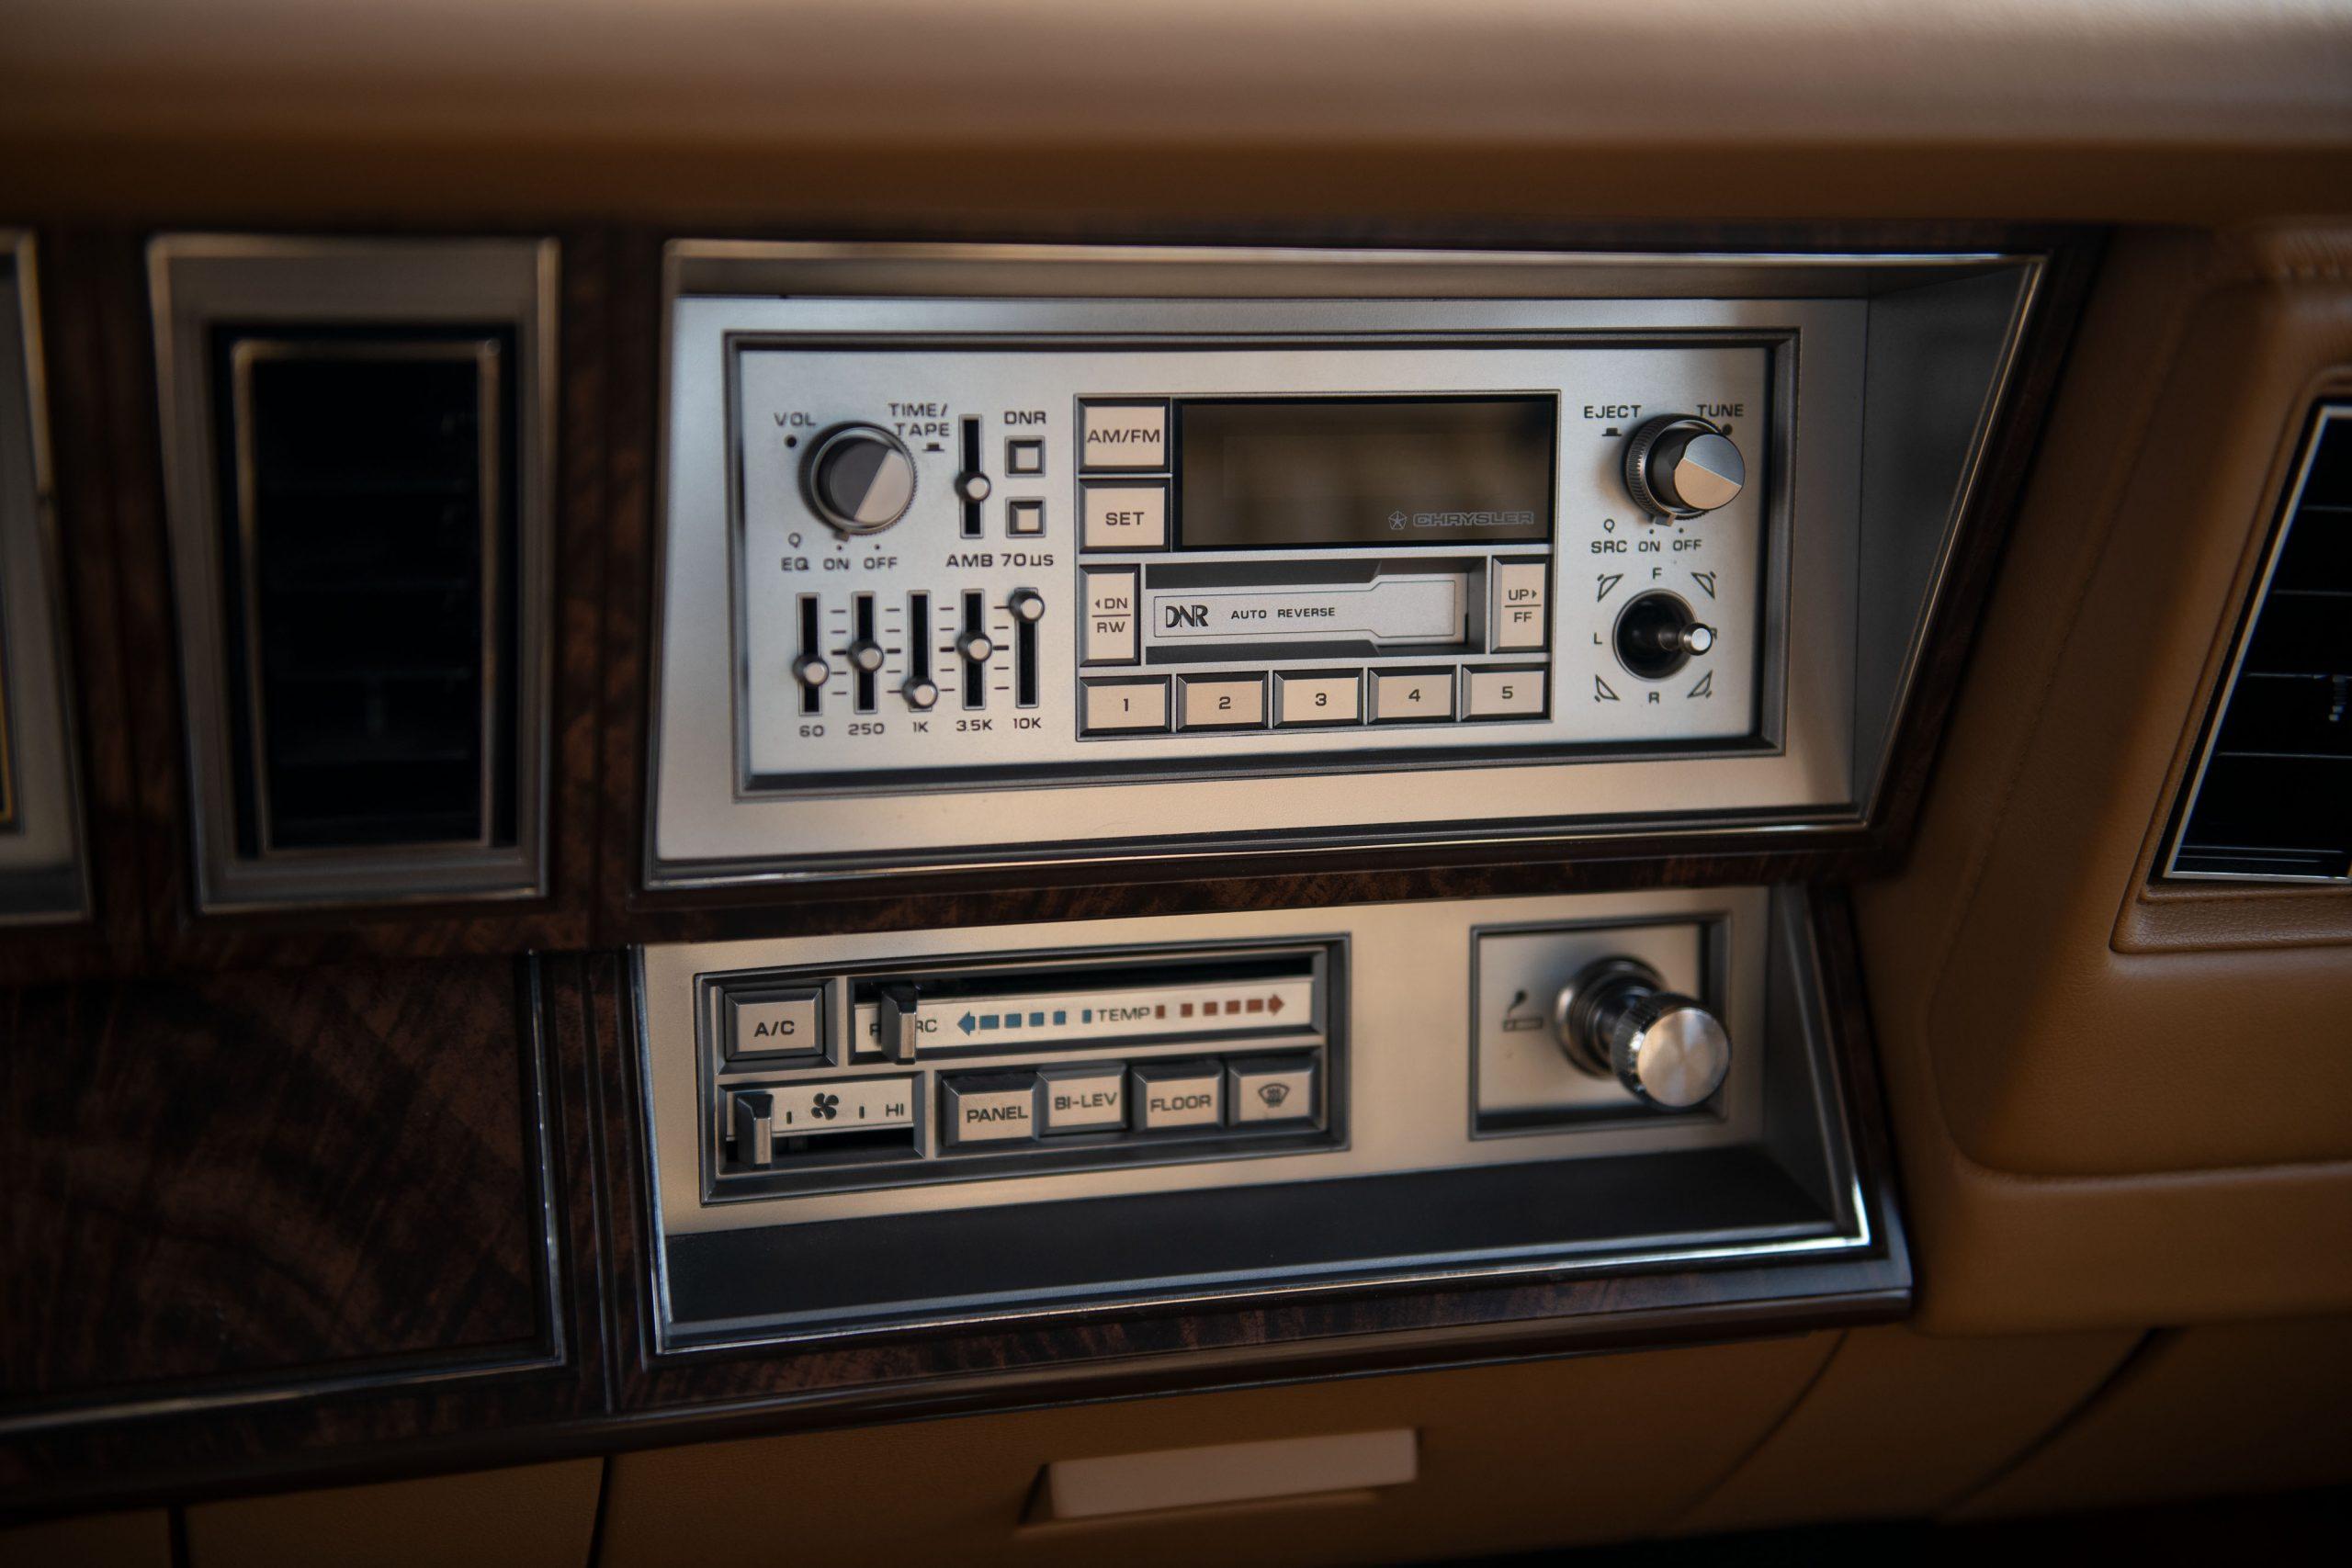 1985-Chrysler-LeBaron interior radio